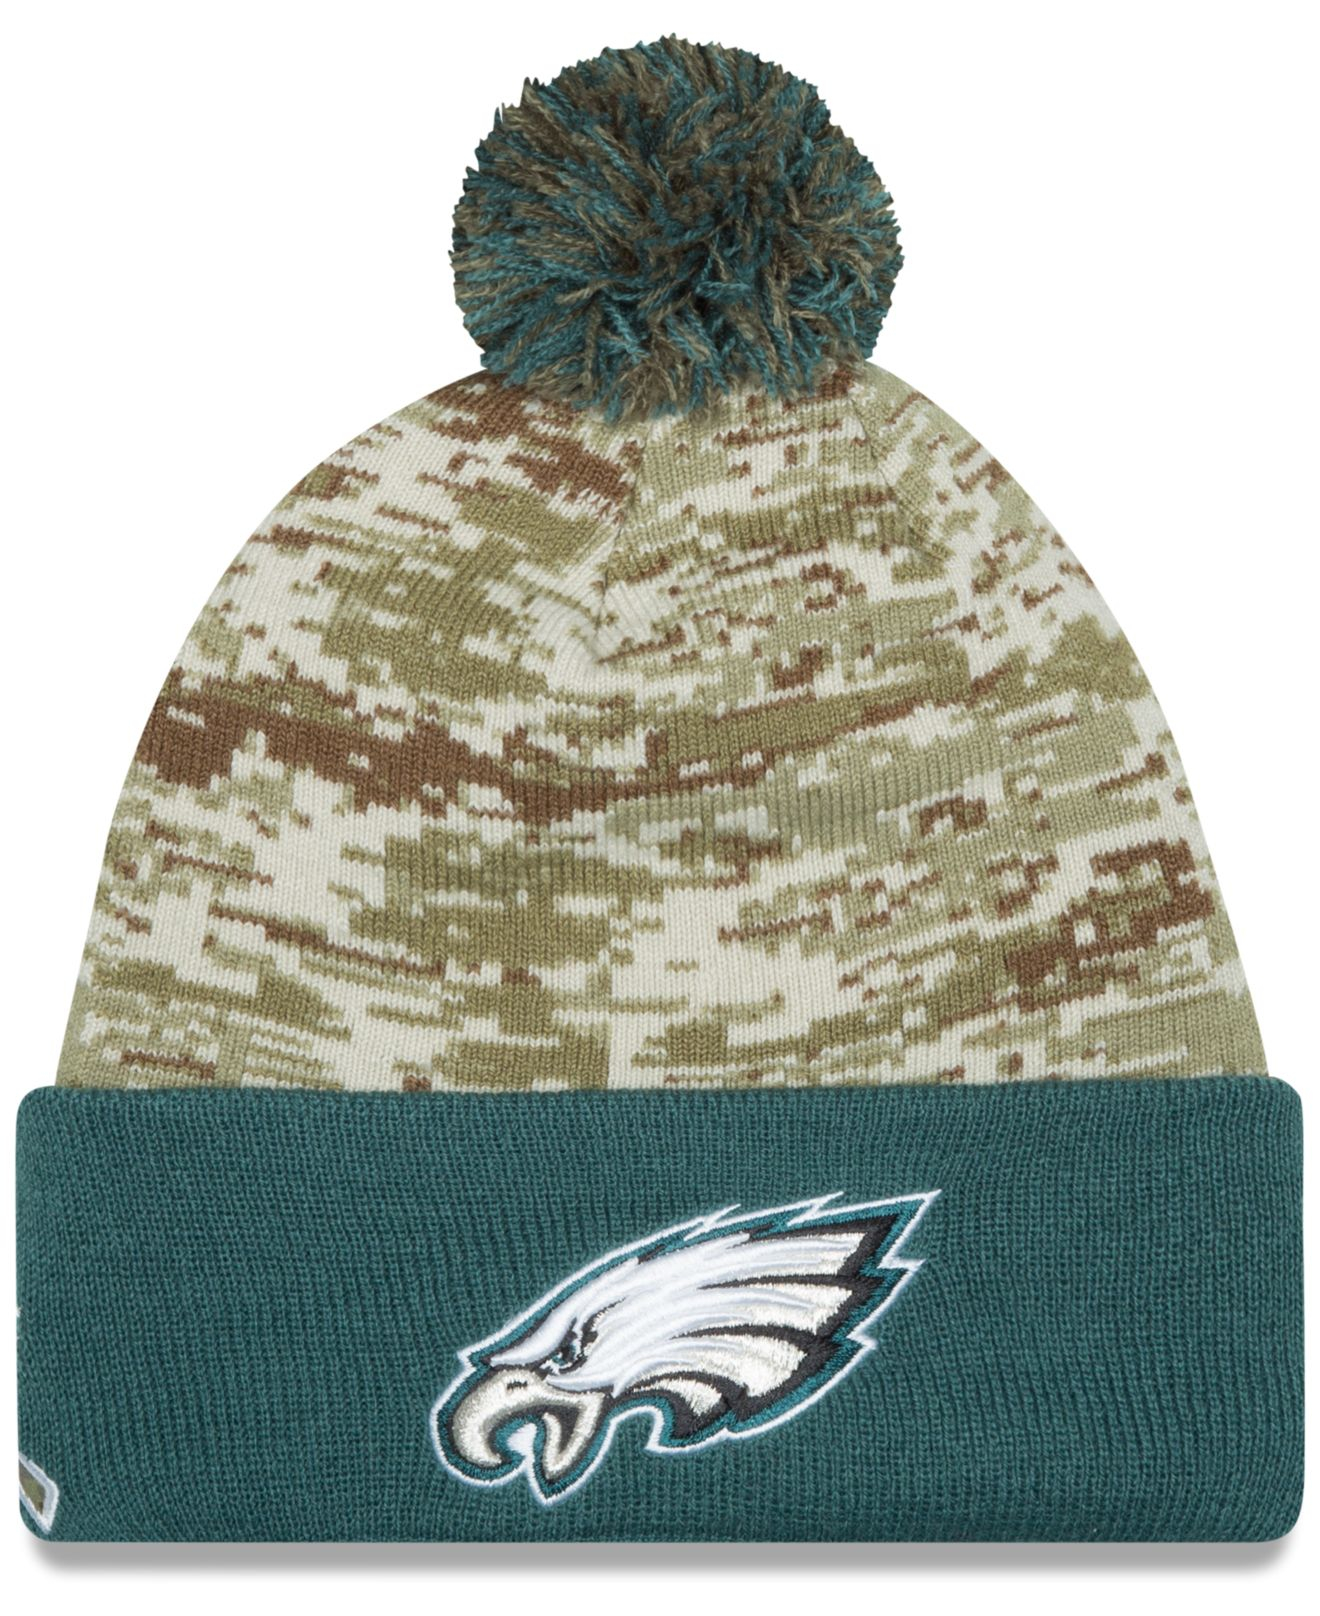 0ad4b483 ... amazon lyst ktz philadelphia eagles salute to service knit hat in green  09fd7 abc3a